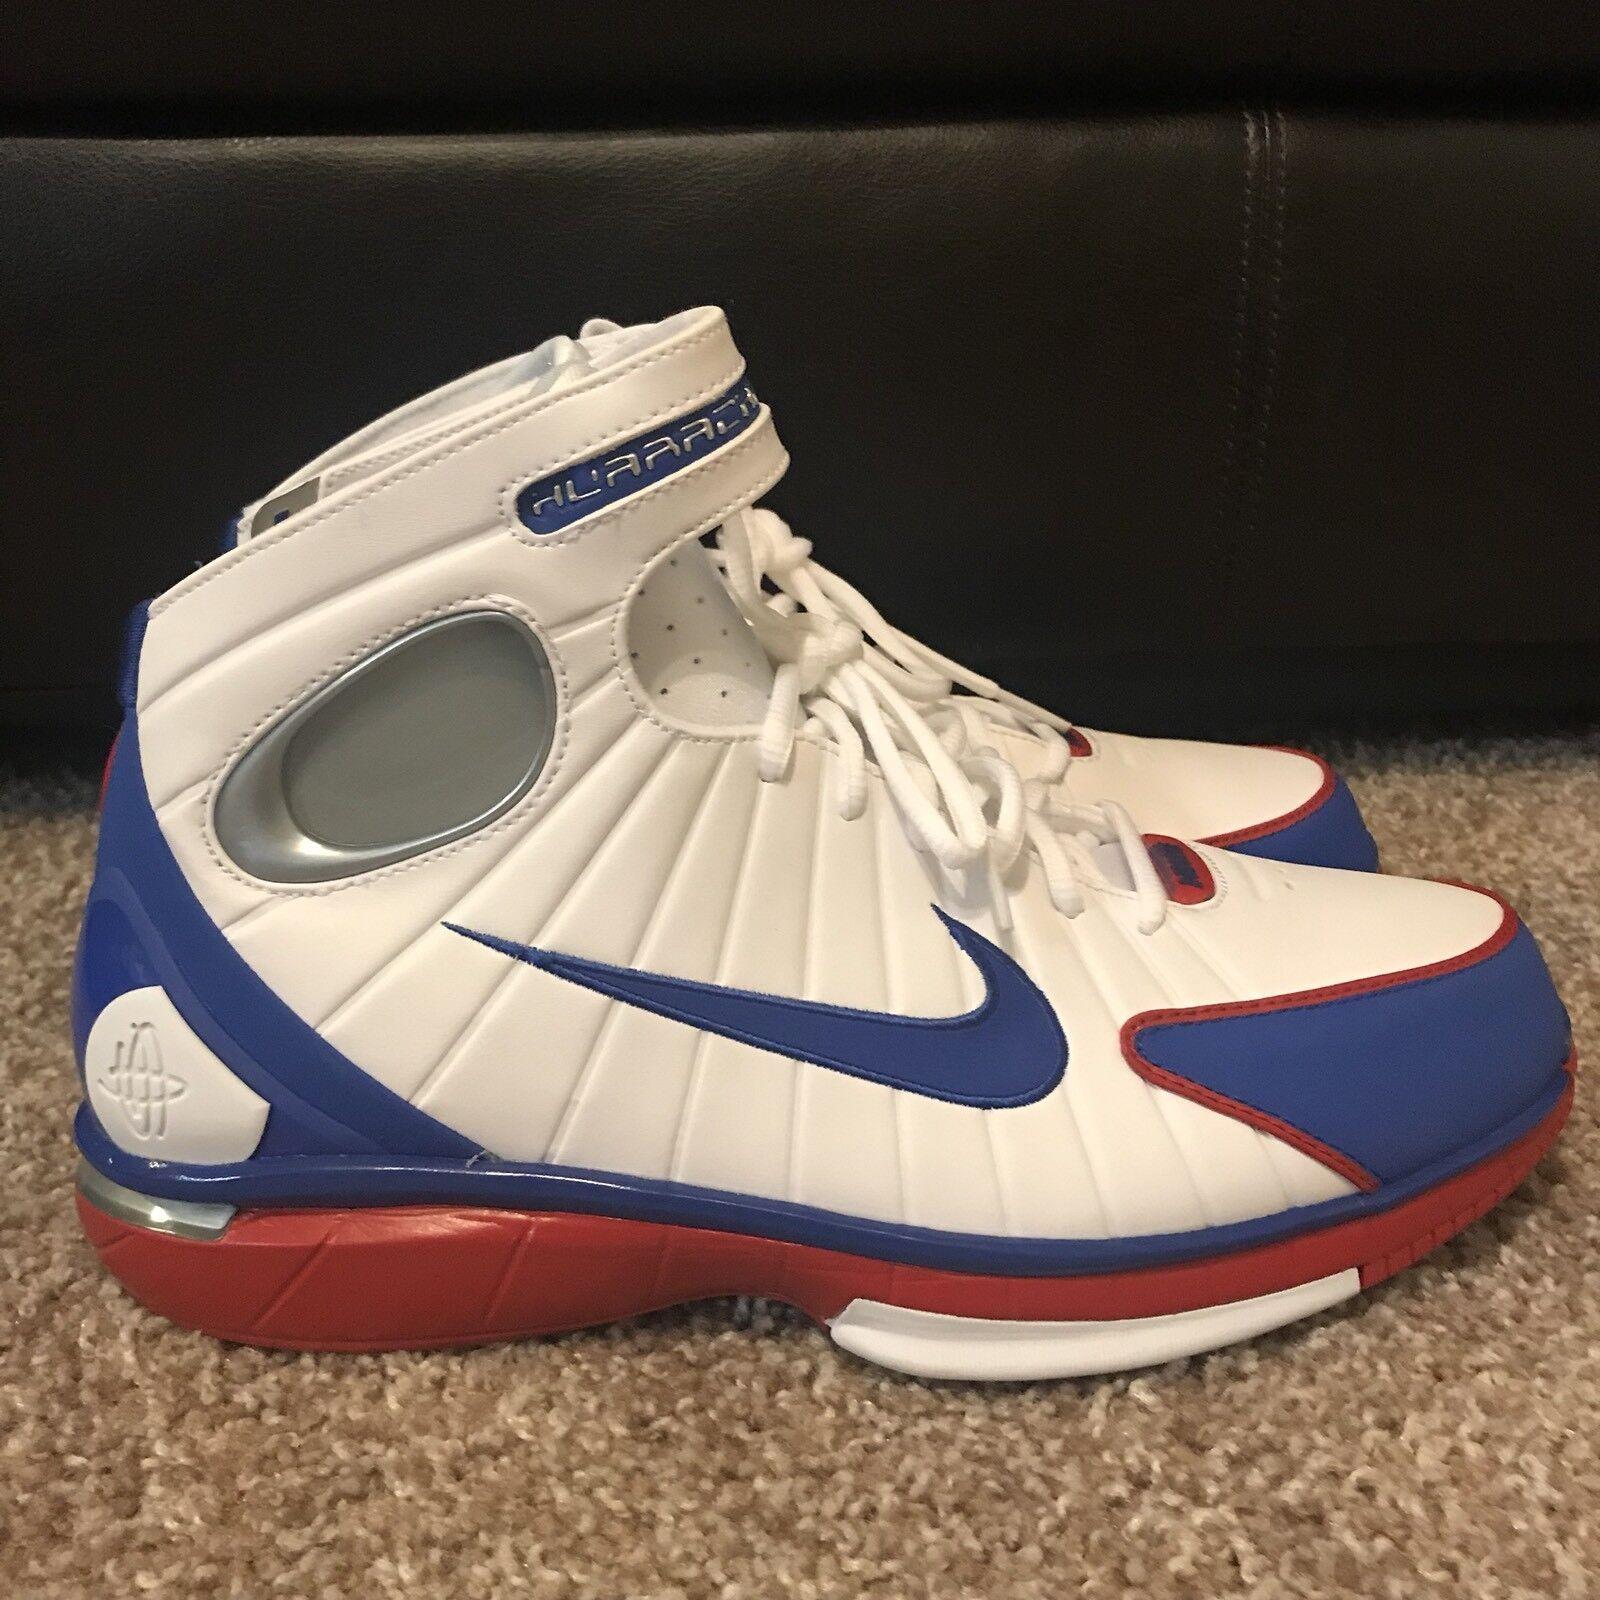 Nike Air Zoom Huarache 2K4  All Star  Men's Basketball Sneakers 308475-100 SZ 11